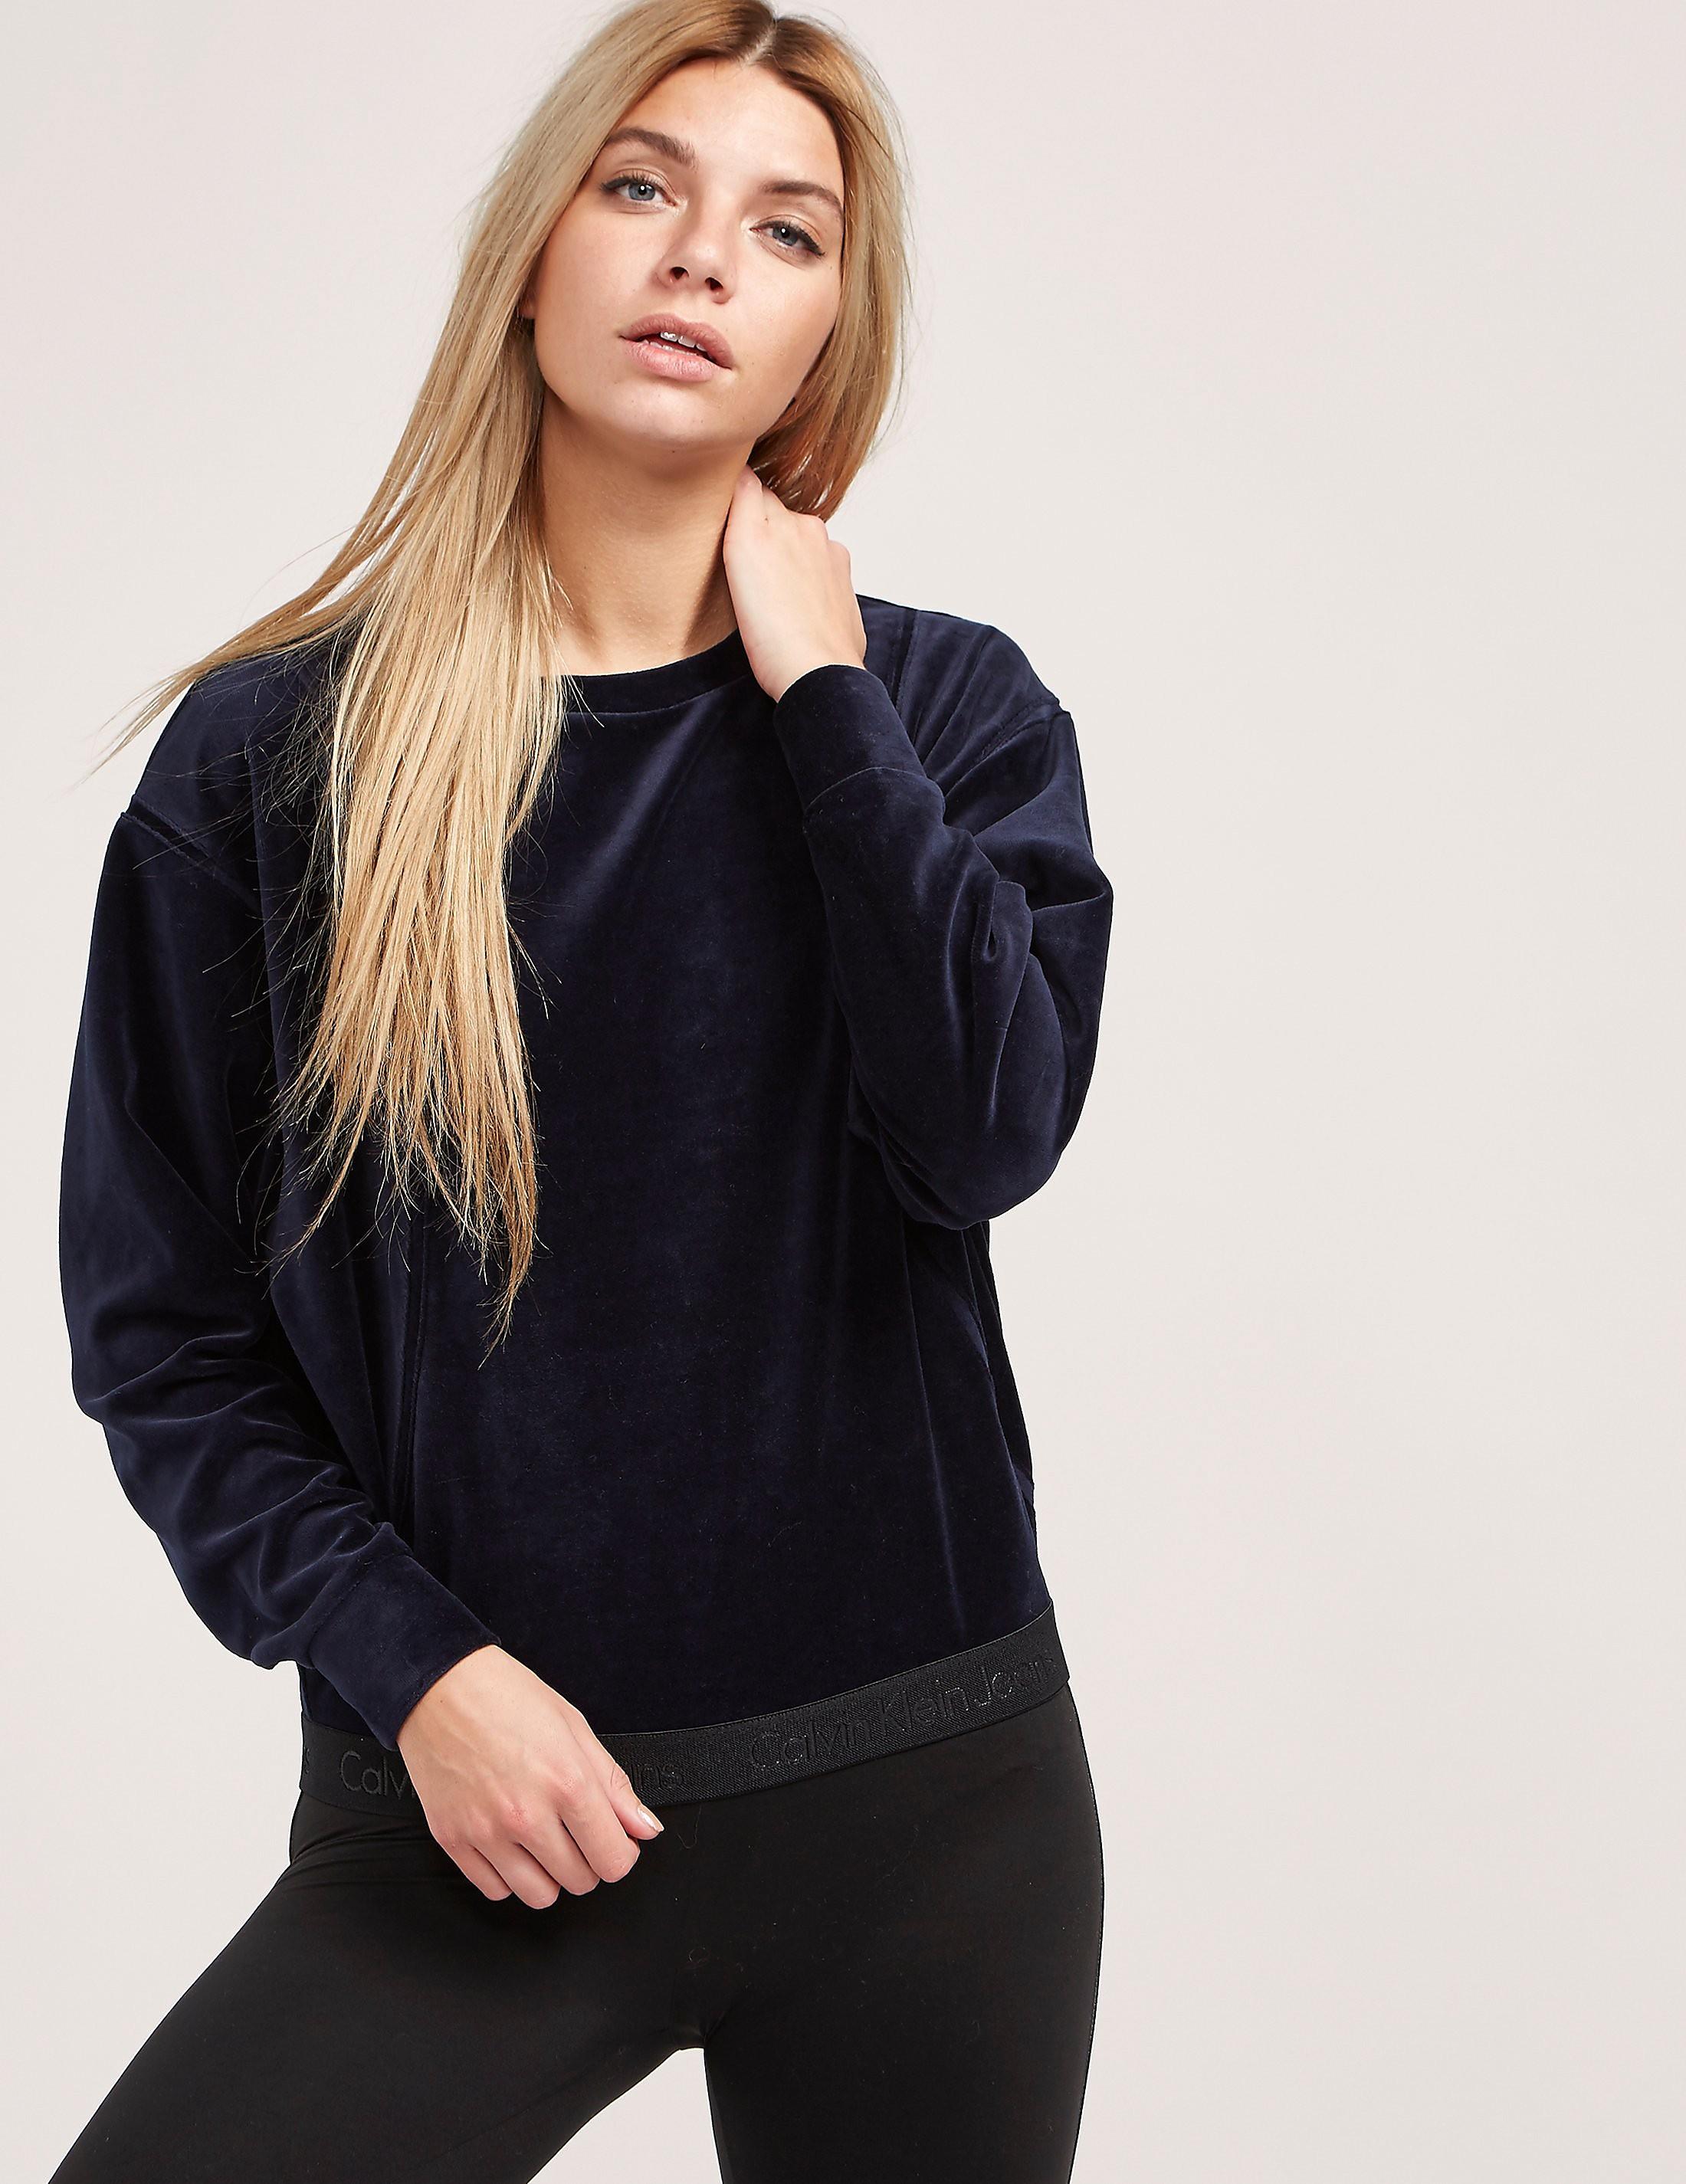 Calvin Klein Herma Velour Sweatshirt